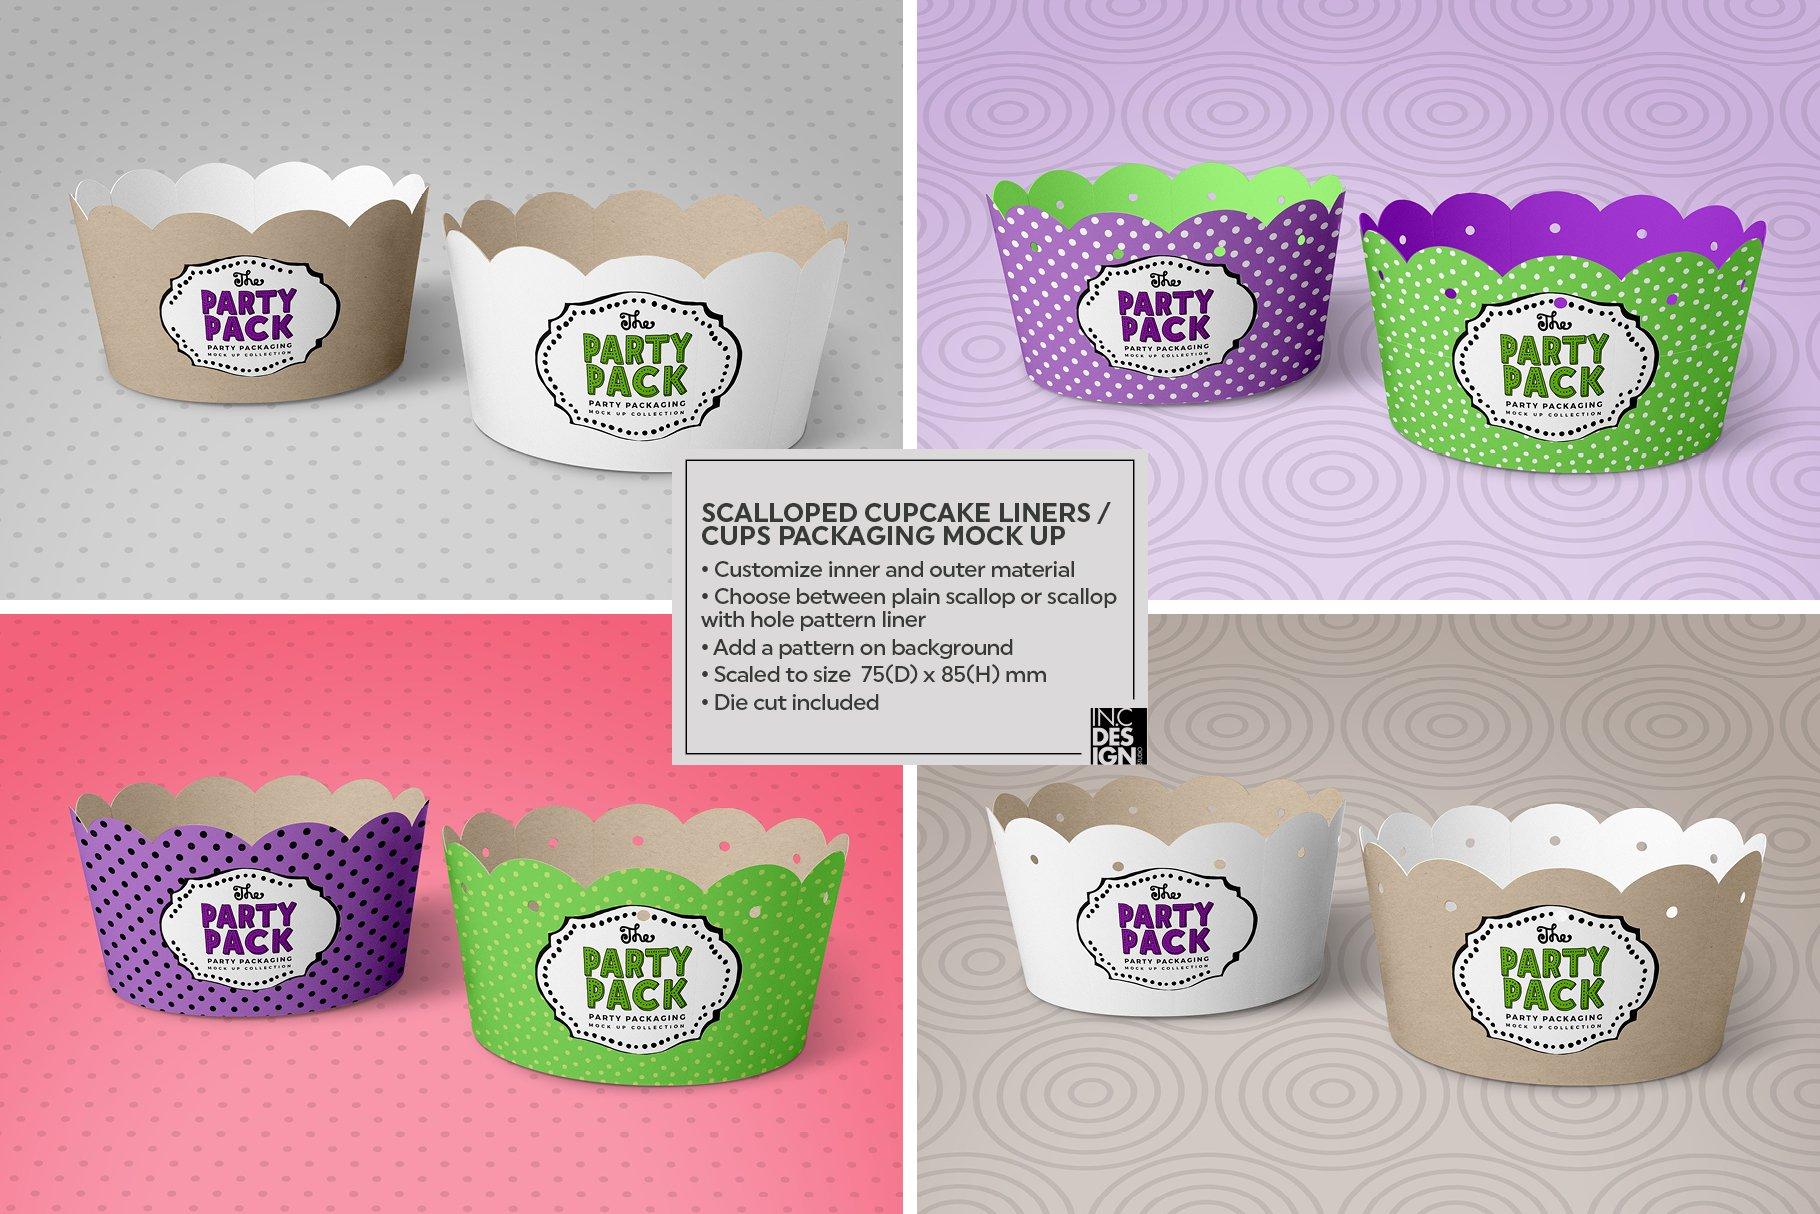 纸杯蛋糕杯包装设计PS贴图样机 Cupcake Cups Packaging Mockup插图2